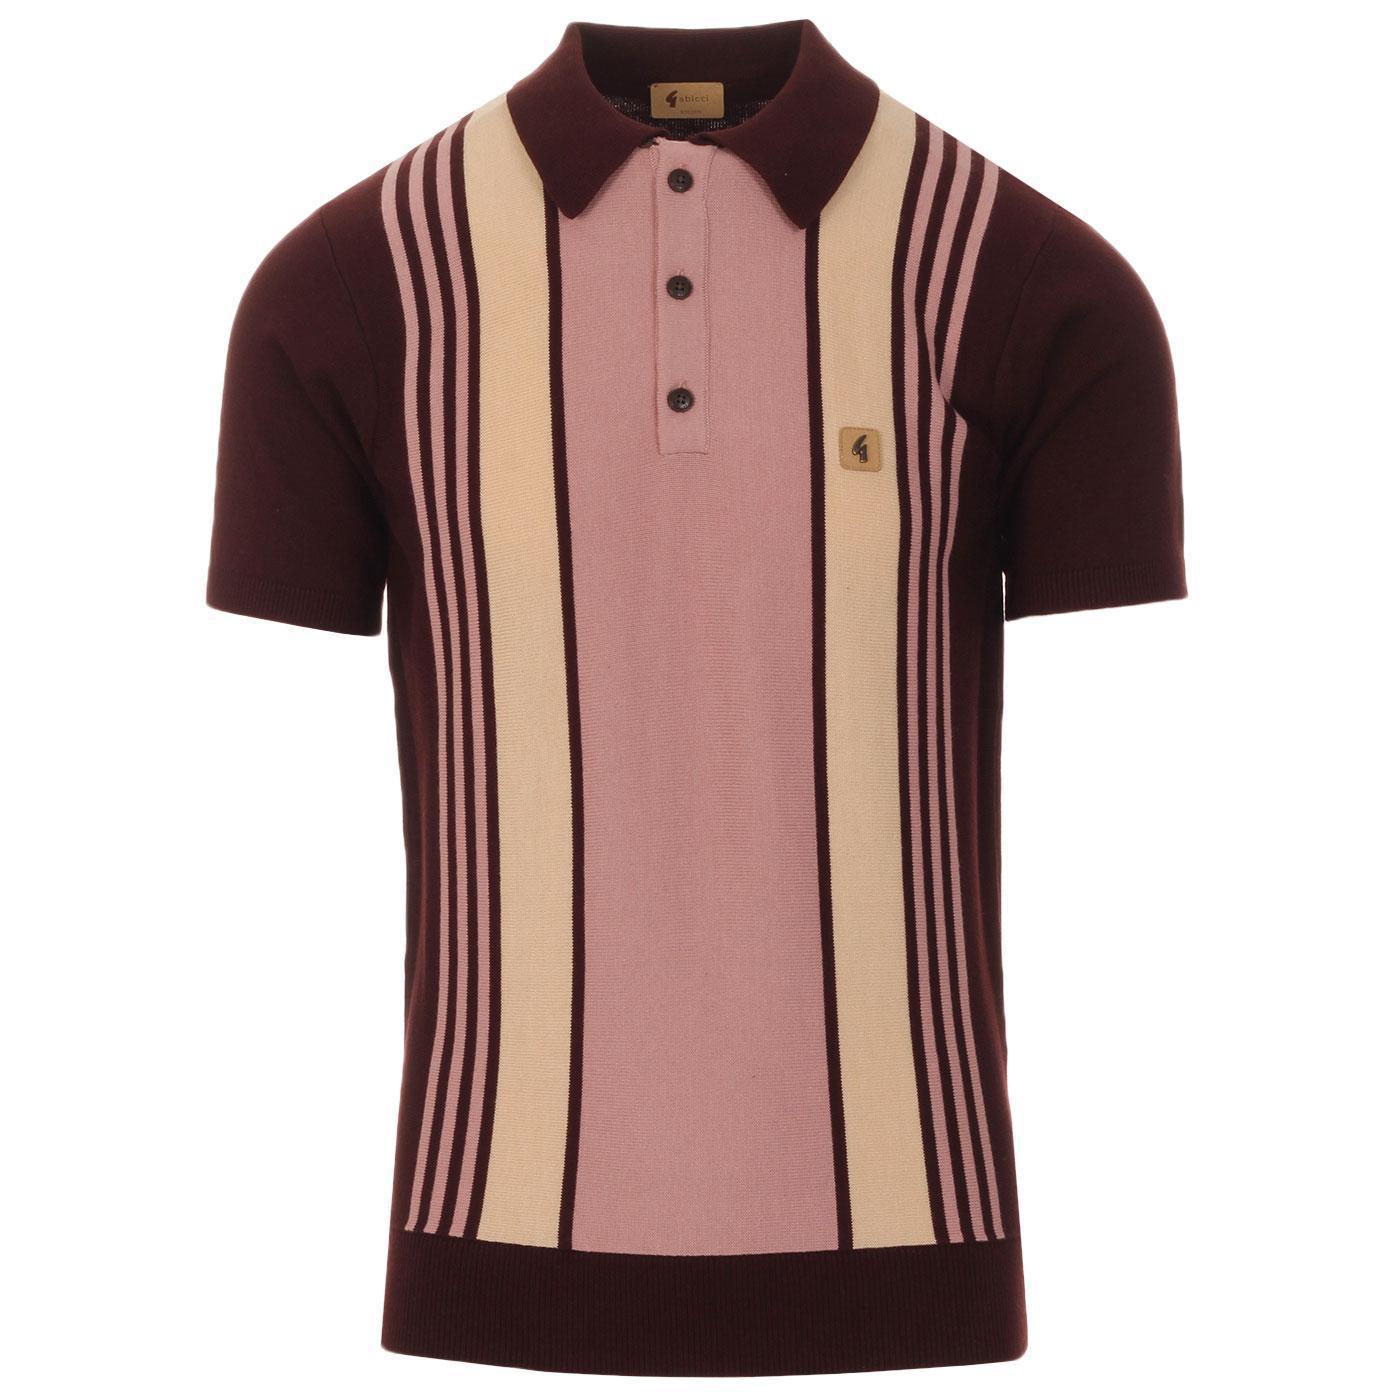 Searle GABICCI VINTAGE Retro Stripe Knit Polo (O)